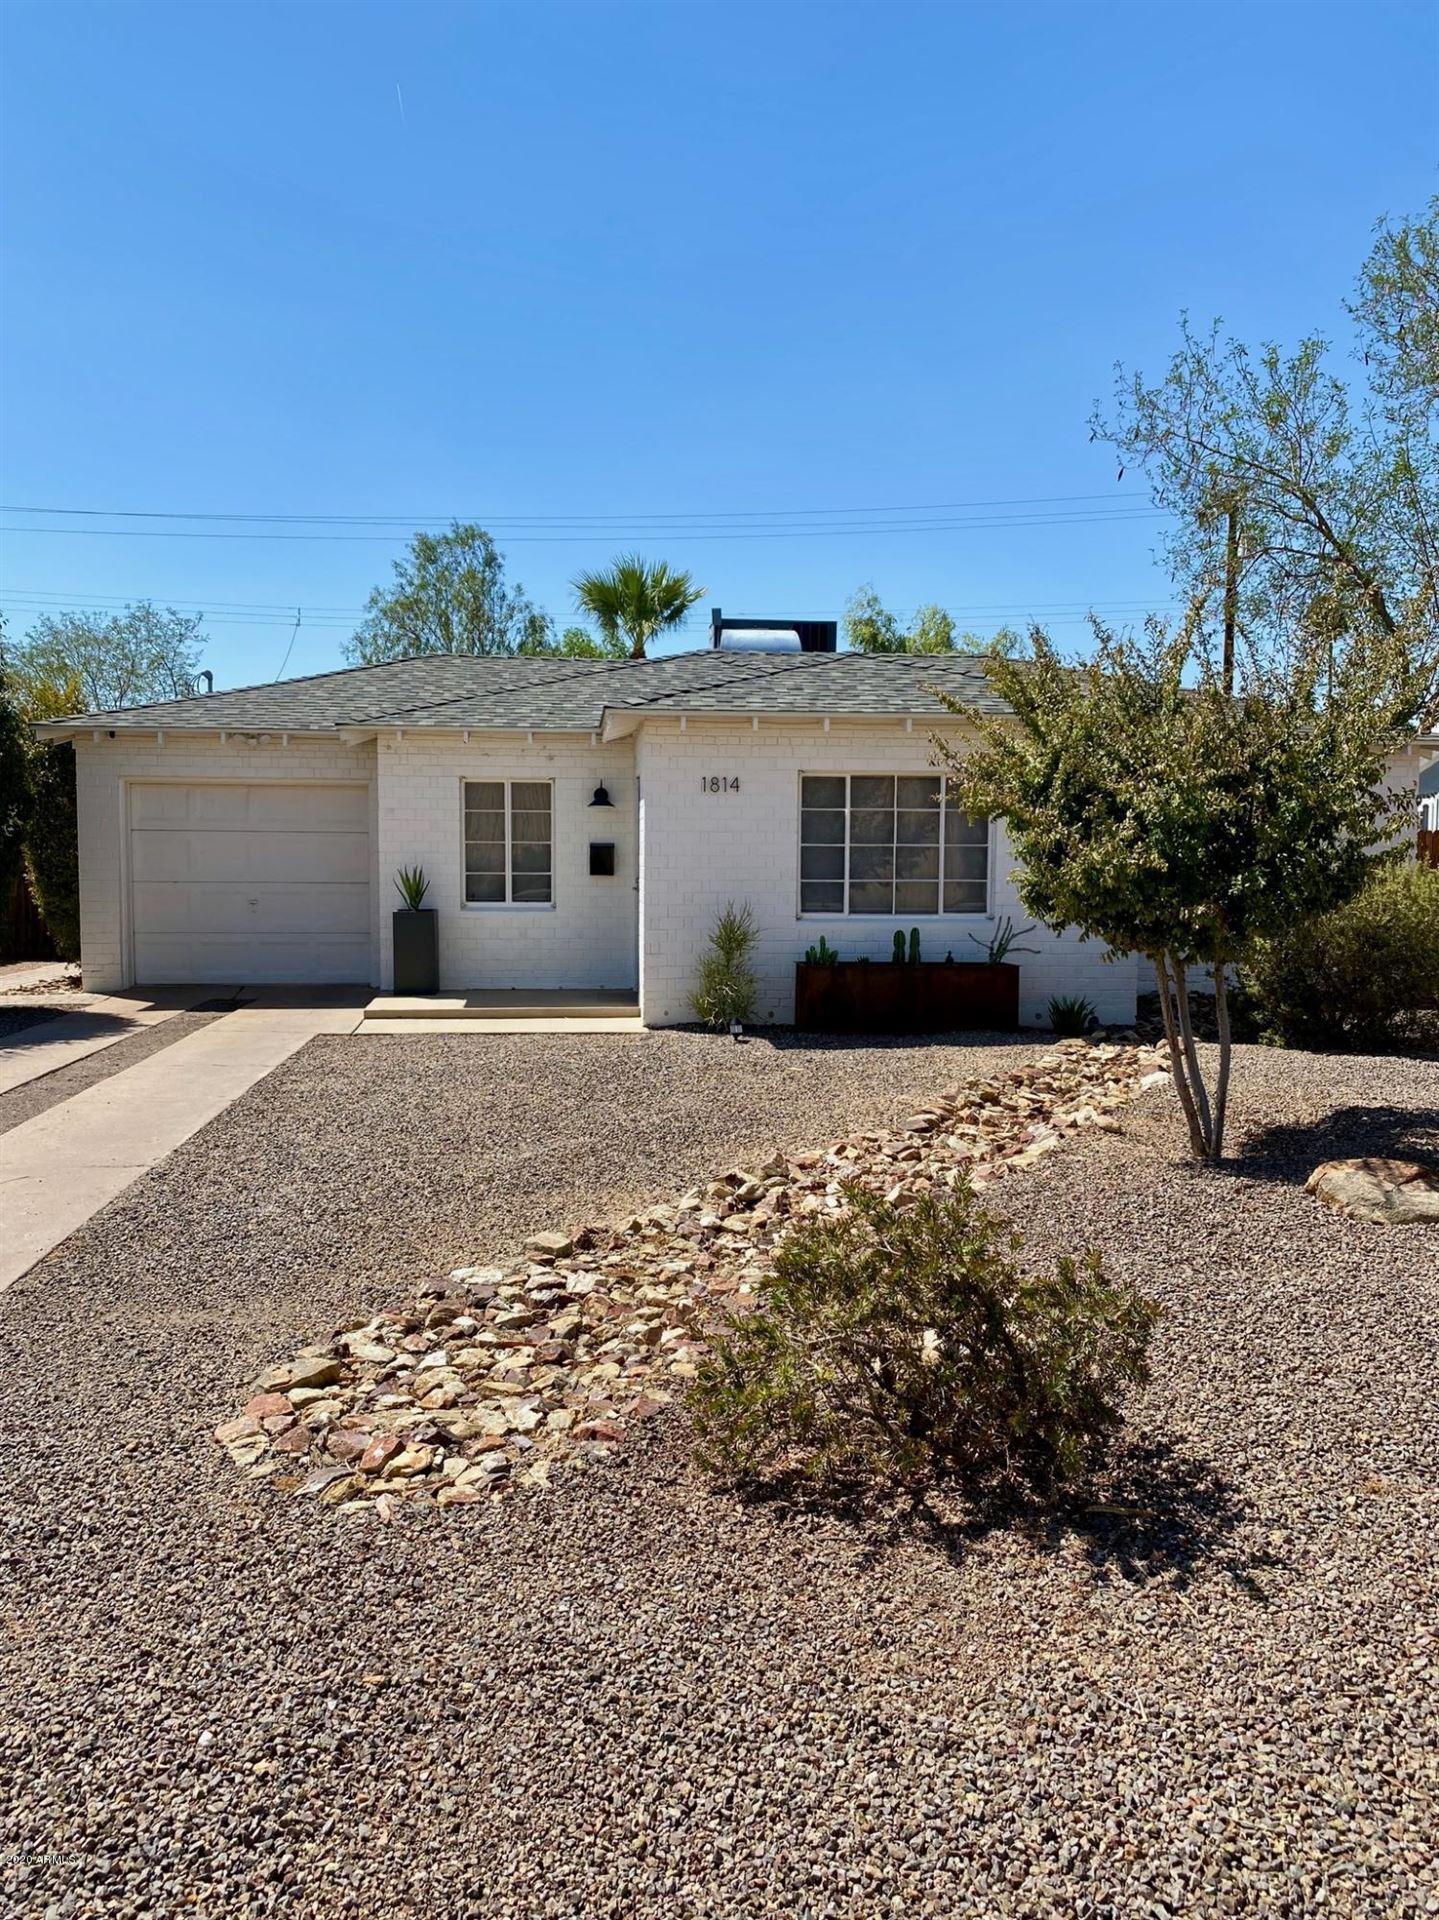 1814 N 20TH Street, Phoenix, AZ 85006 - MLS#: 6126279